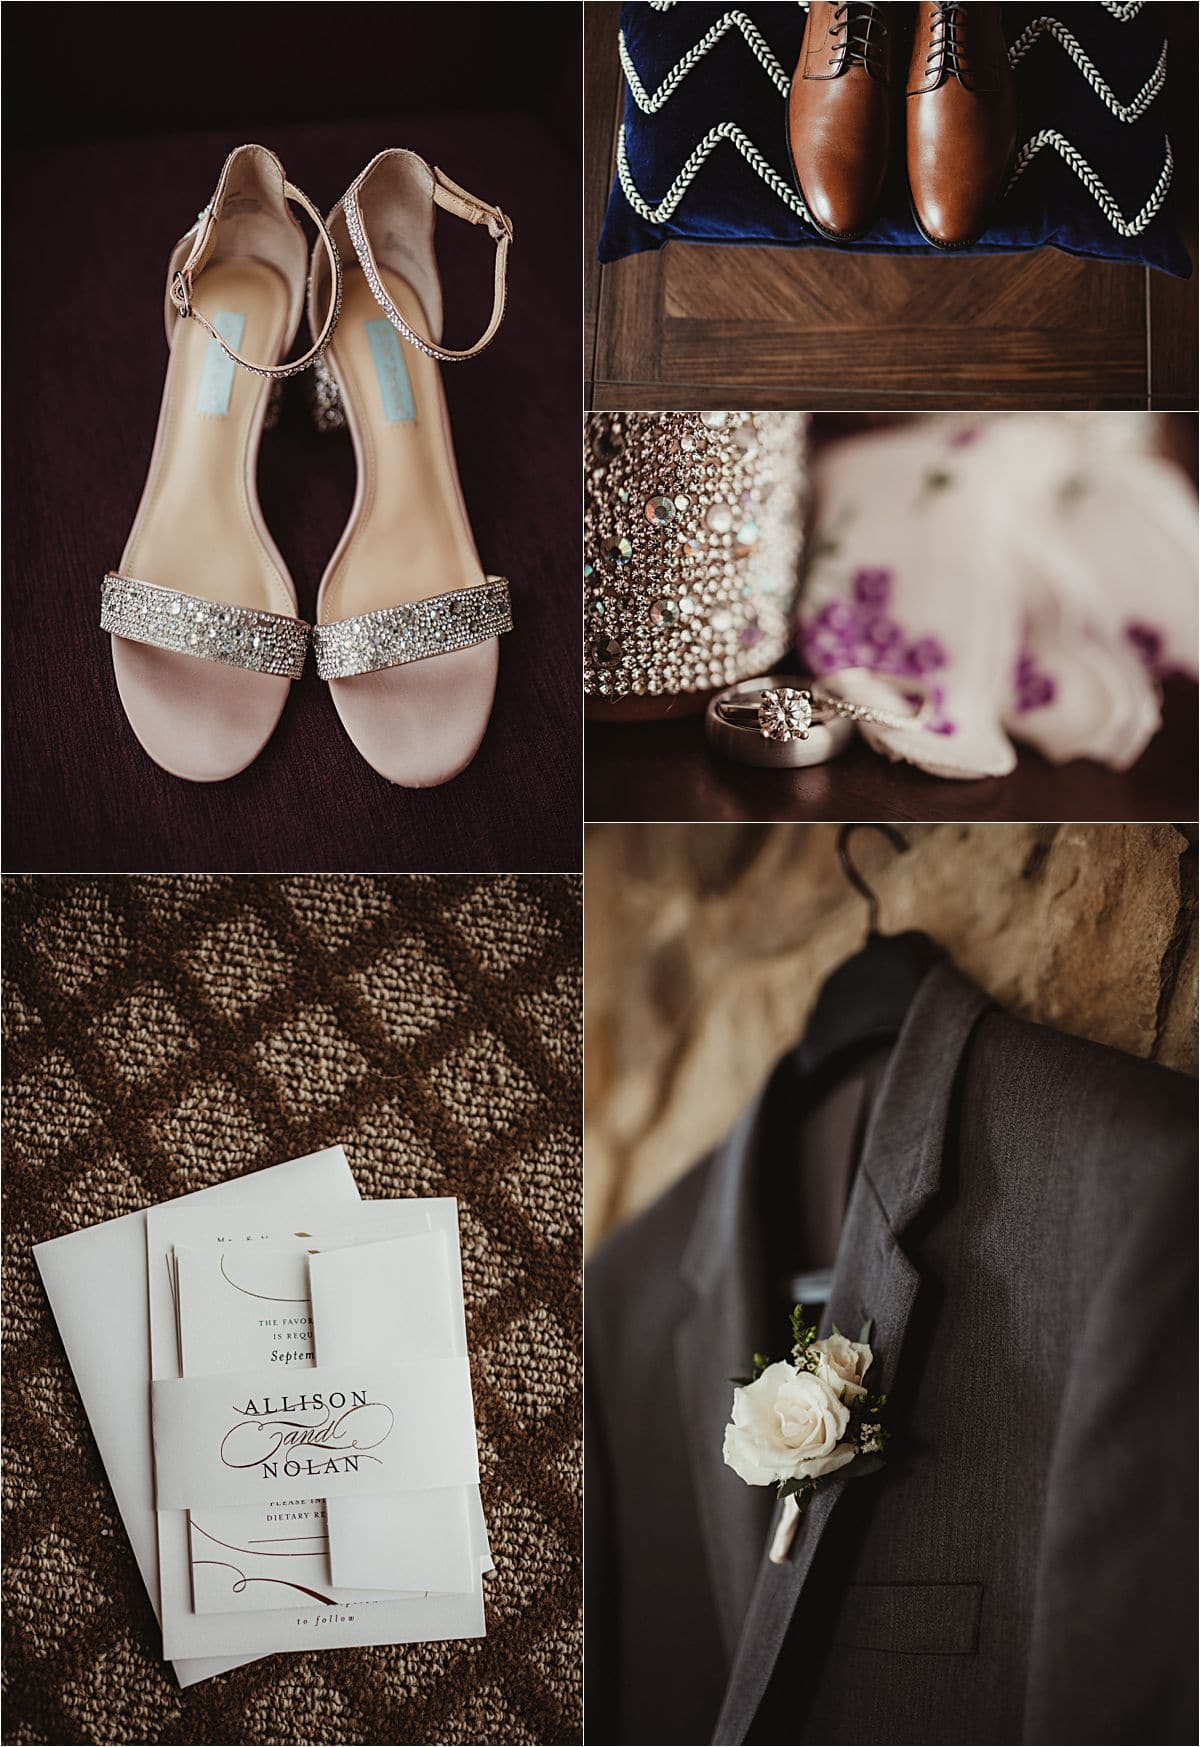 Glamorous Fall Wedding Getting Ready Details